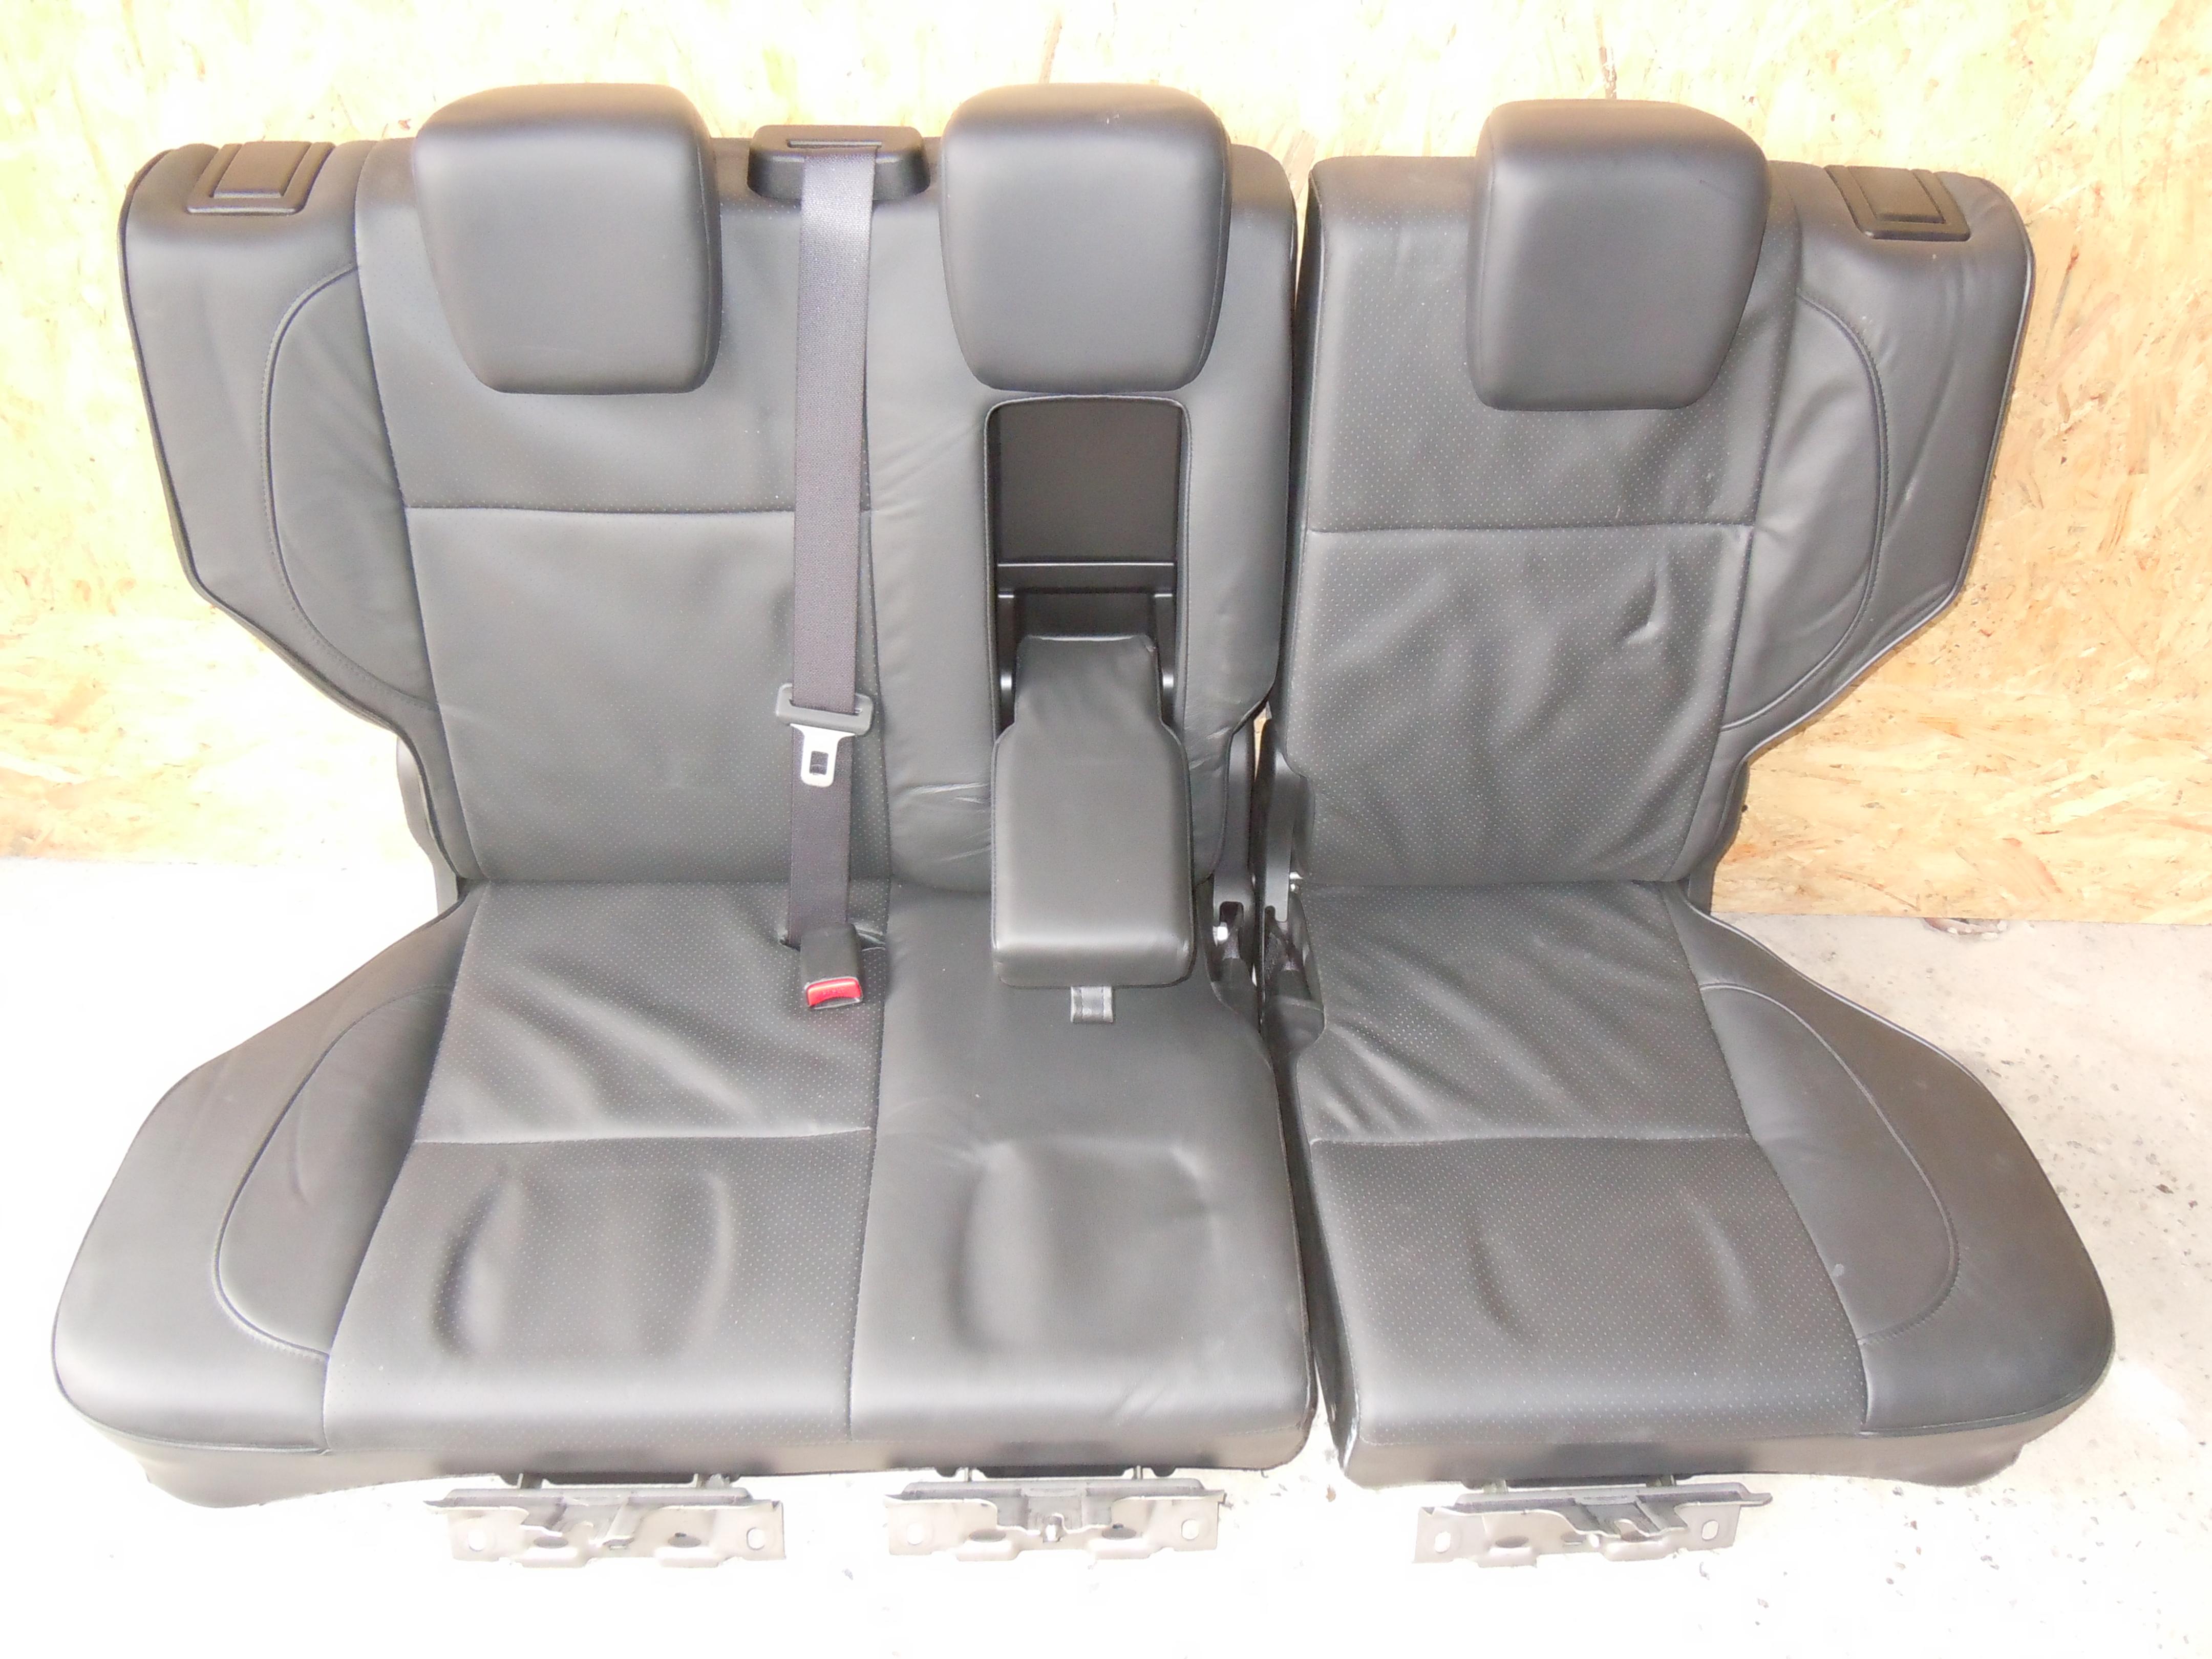 Suzuki Grand vitara 2005-2011 læder/stof - HT Import